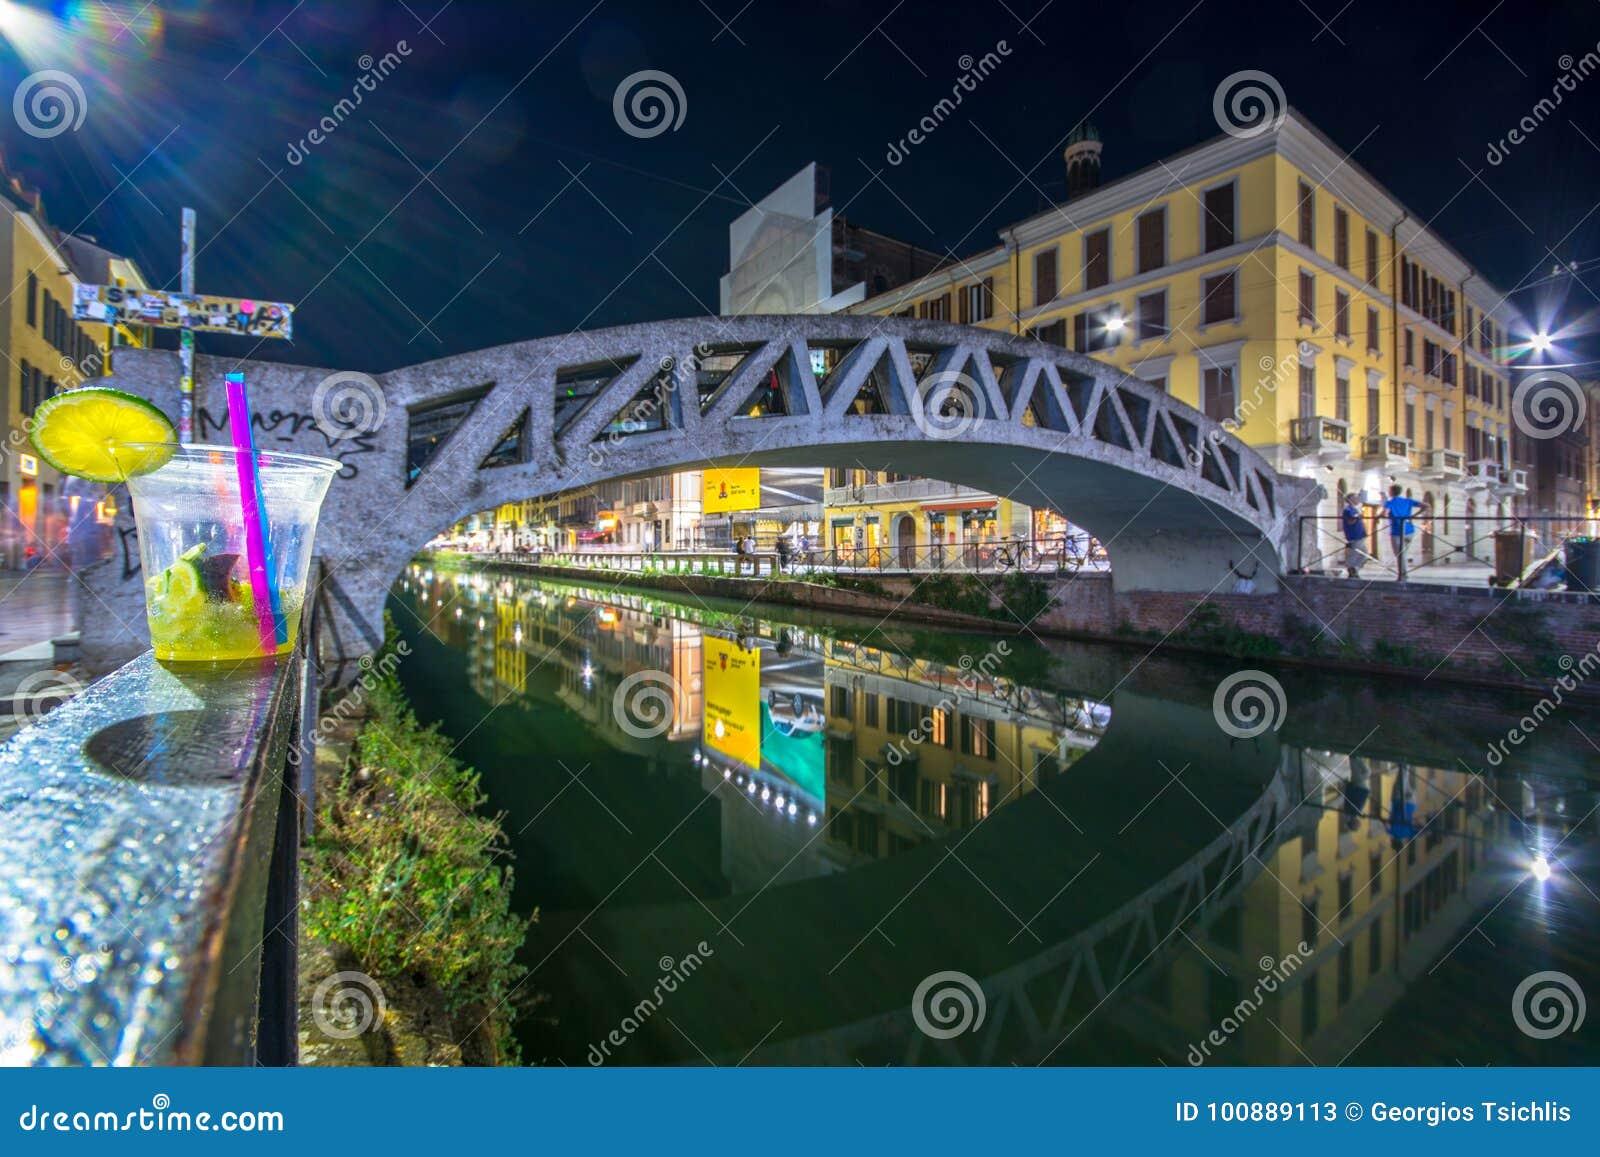 Szenisches Naviglio-Canal Grande in Mailand, Lombardia, Italien